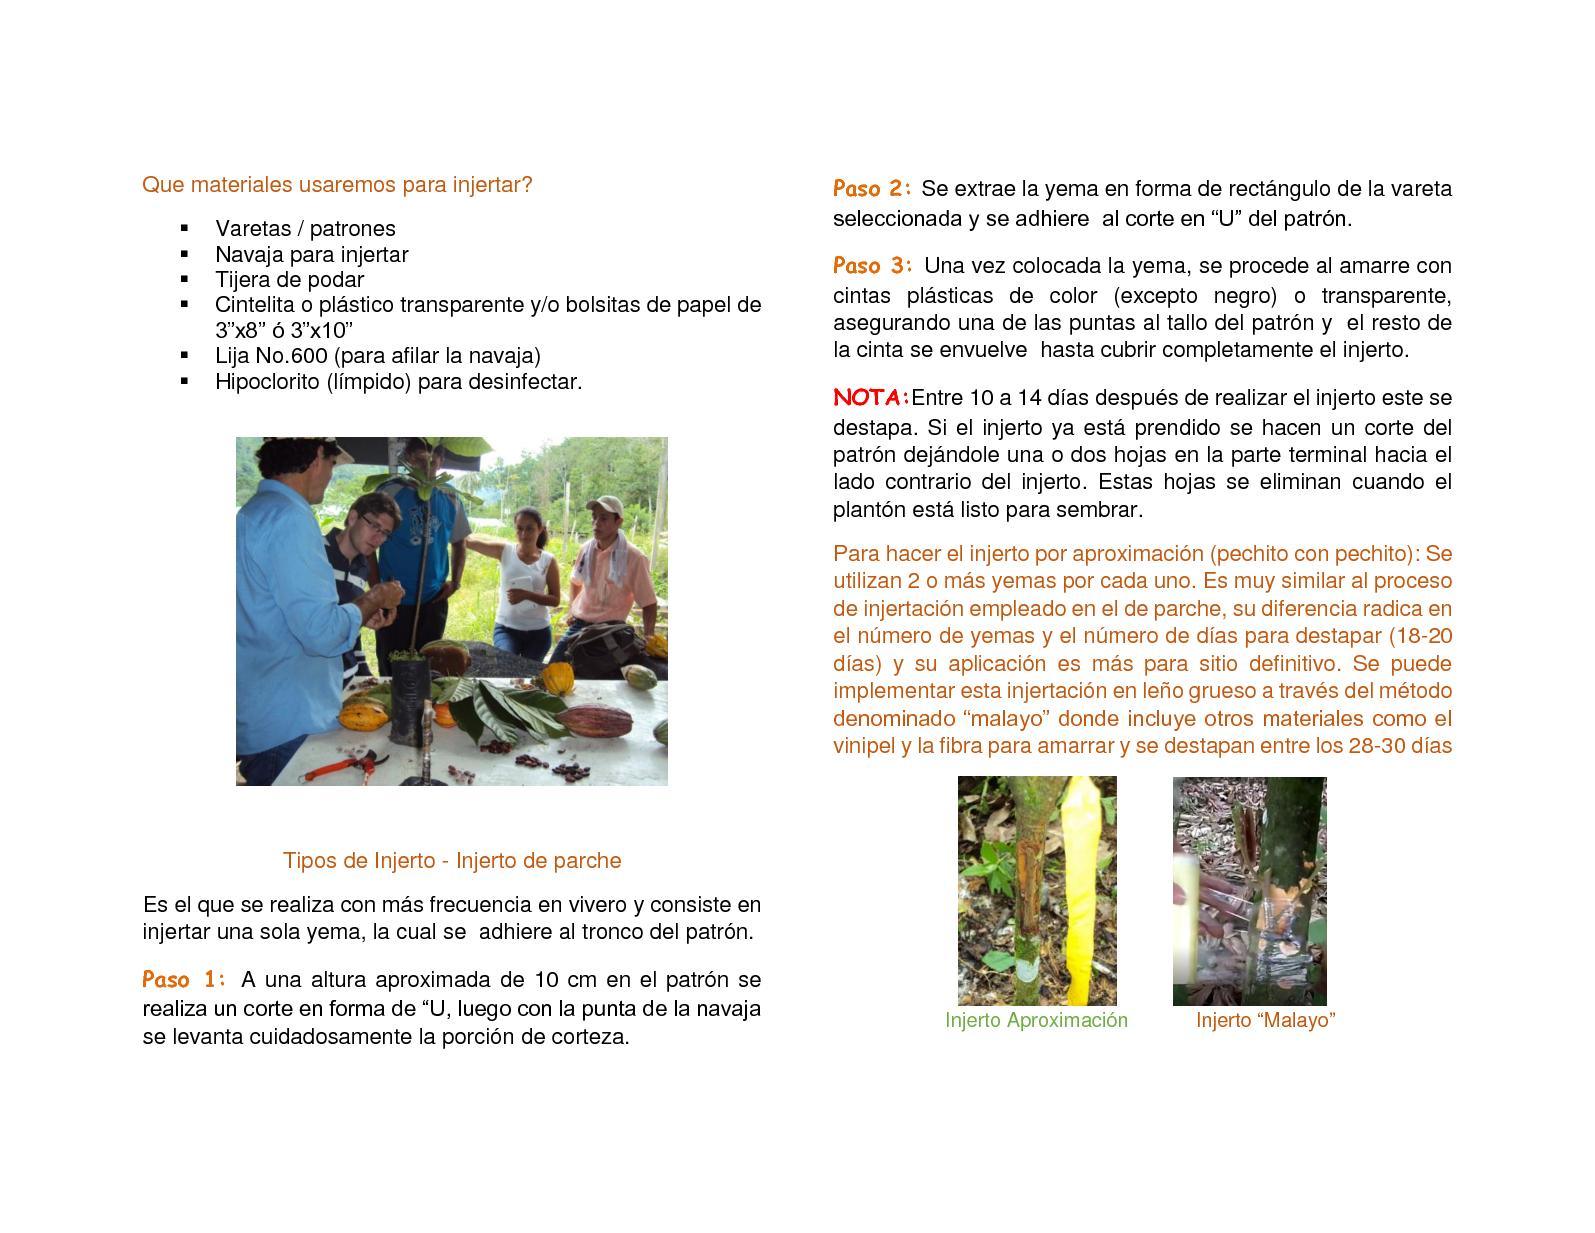 Guia De Cacao Extensionismo Rural - CALAMEO Downloader